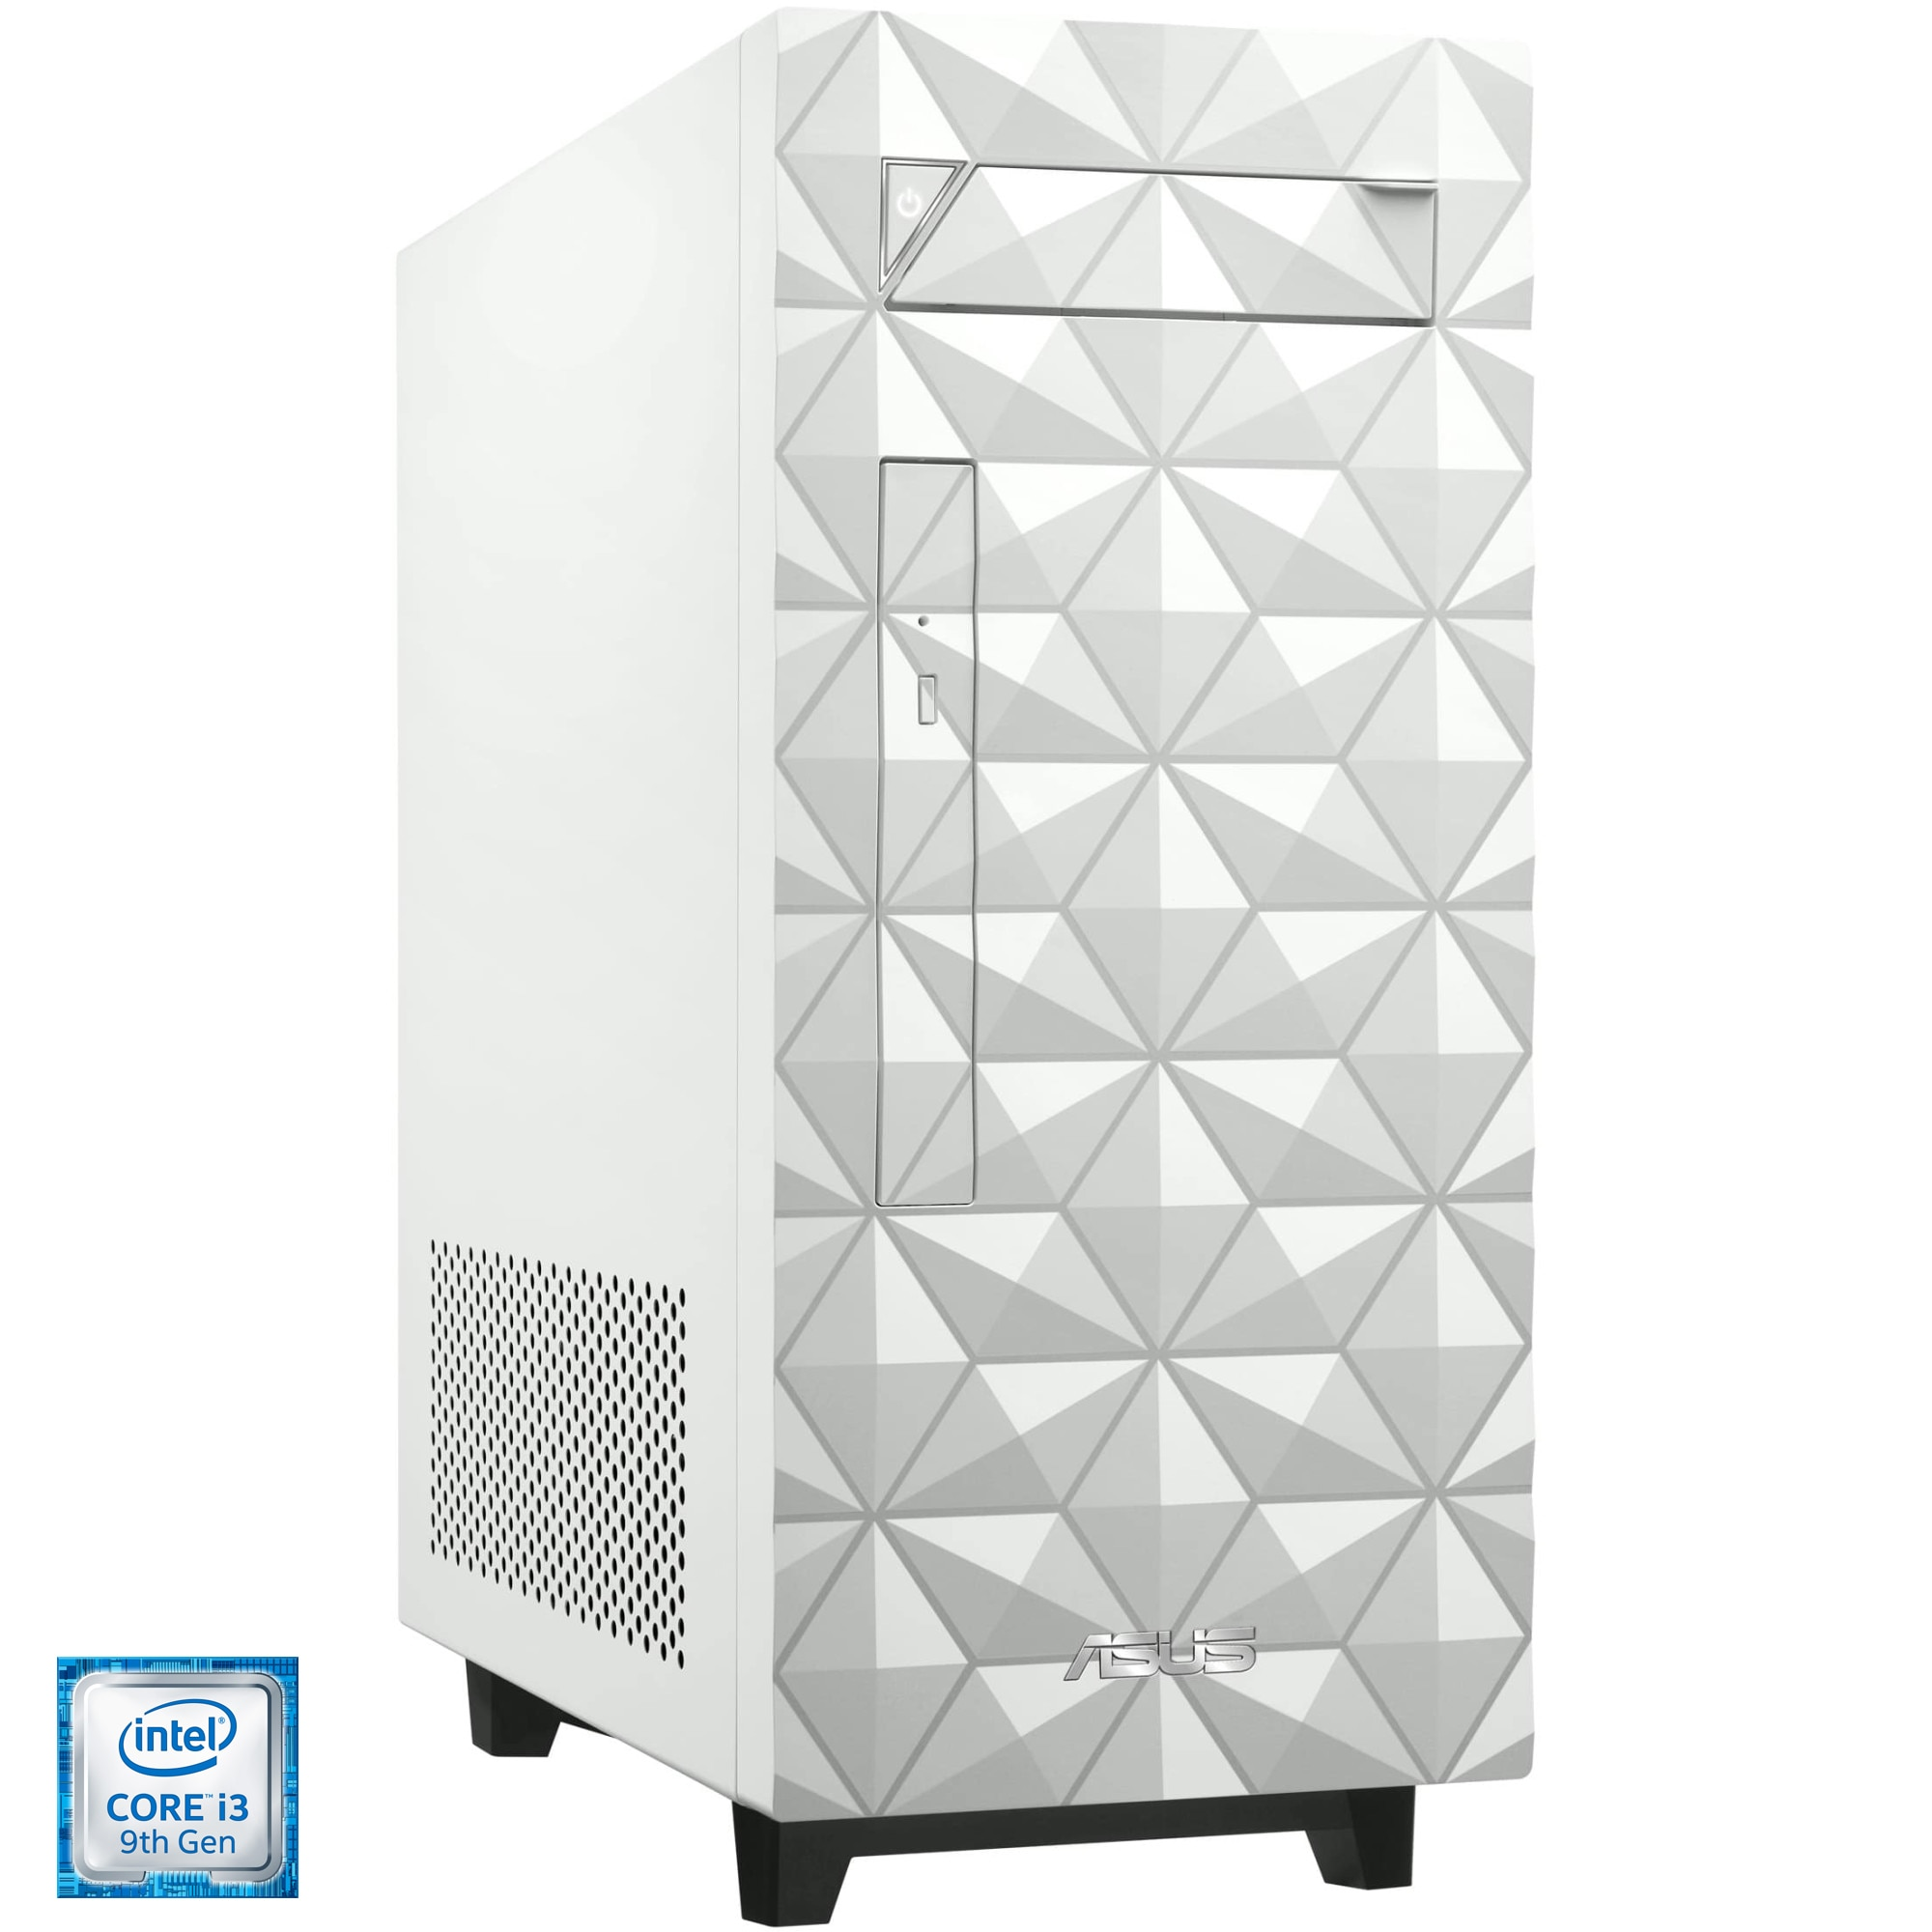 Fotografie Sistem Desktop PC ASUS S340MF cu procesor Intel® Core™ i3-9100F pana la 4.20 GHz, Coffee Lake, 8GB DDR4, 256GB SSD M.2 NVMe™, Wi-Fi, DVD-RW, NVIDIA® GeForce® GT1030 2GB, Free DOS, White, Mouse + Tastatura